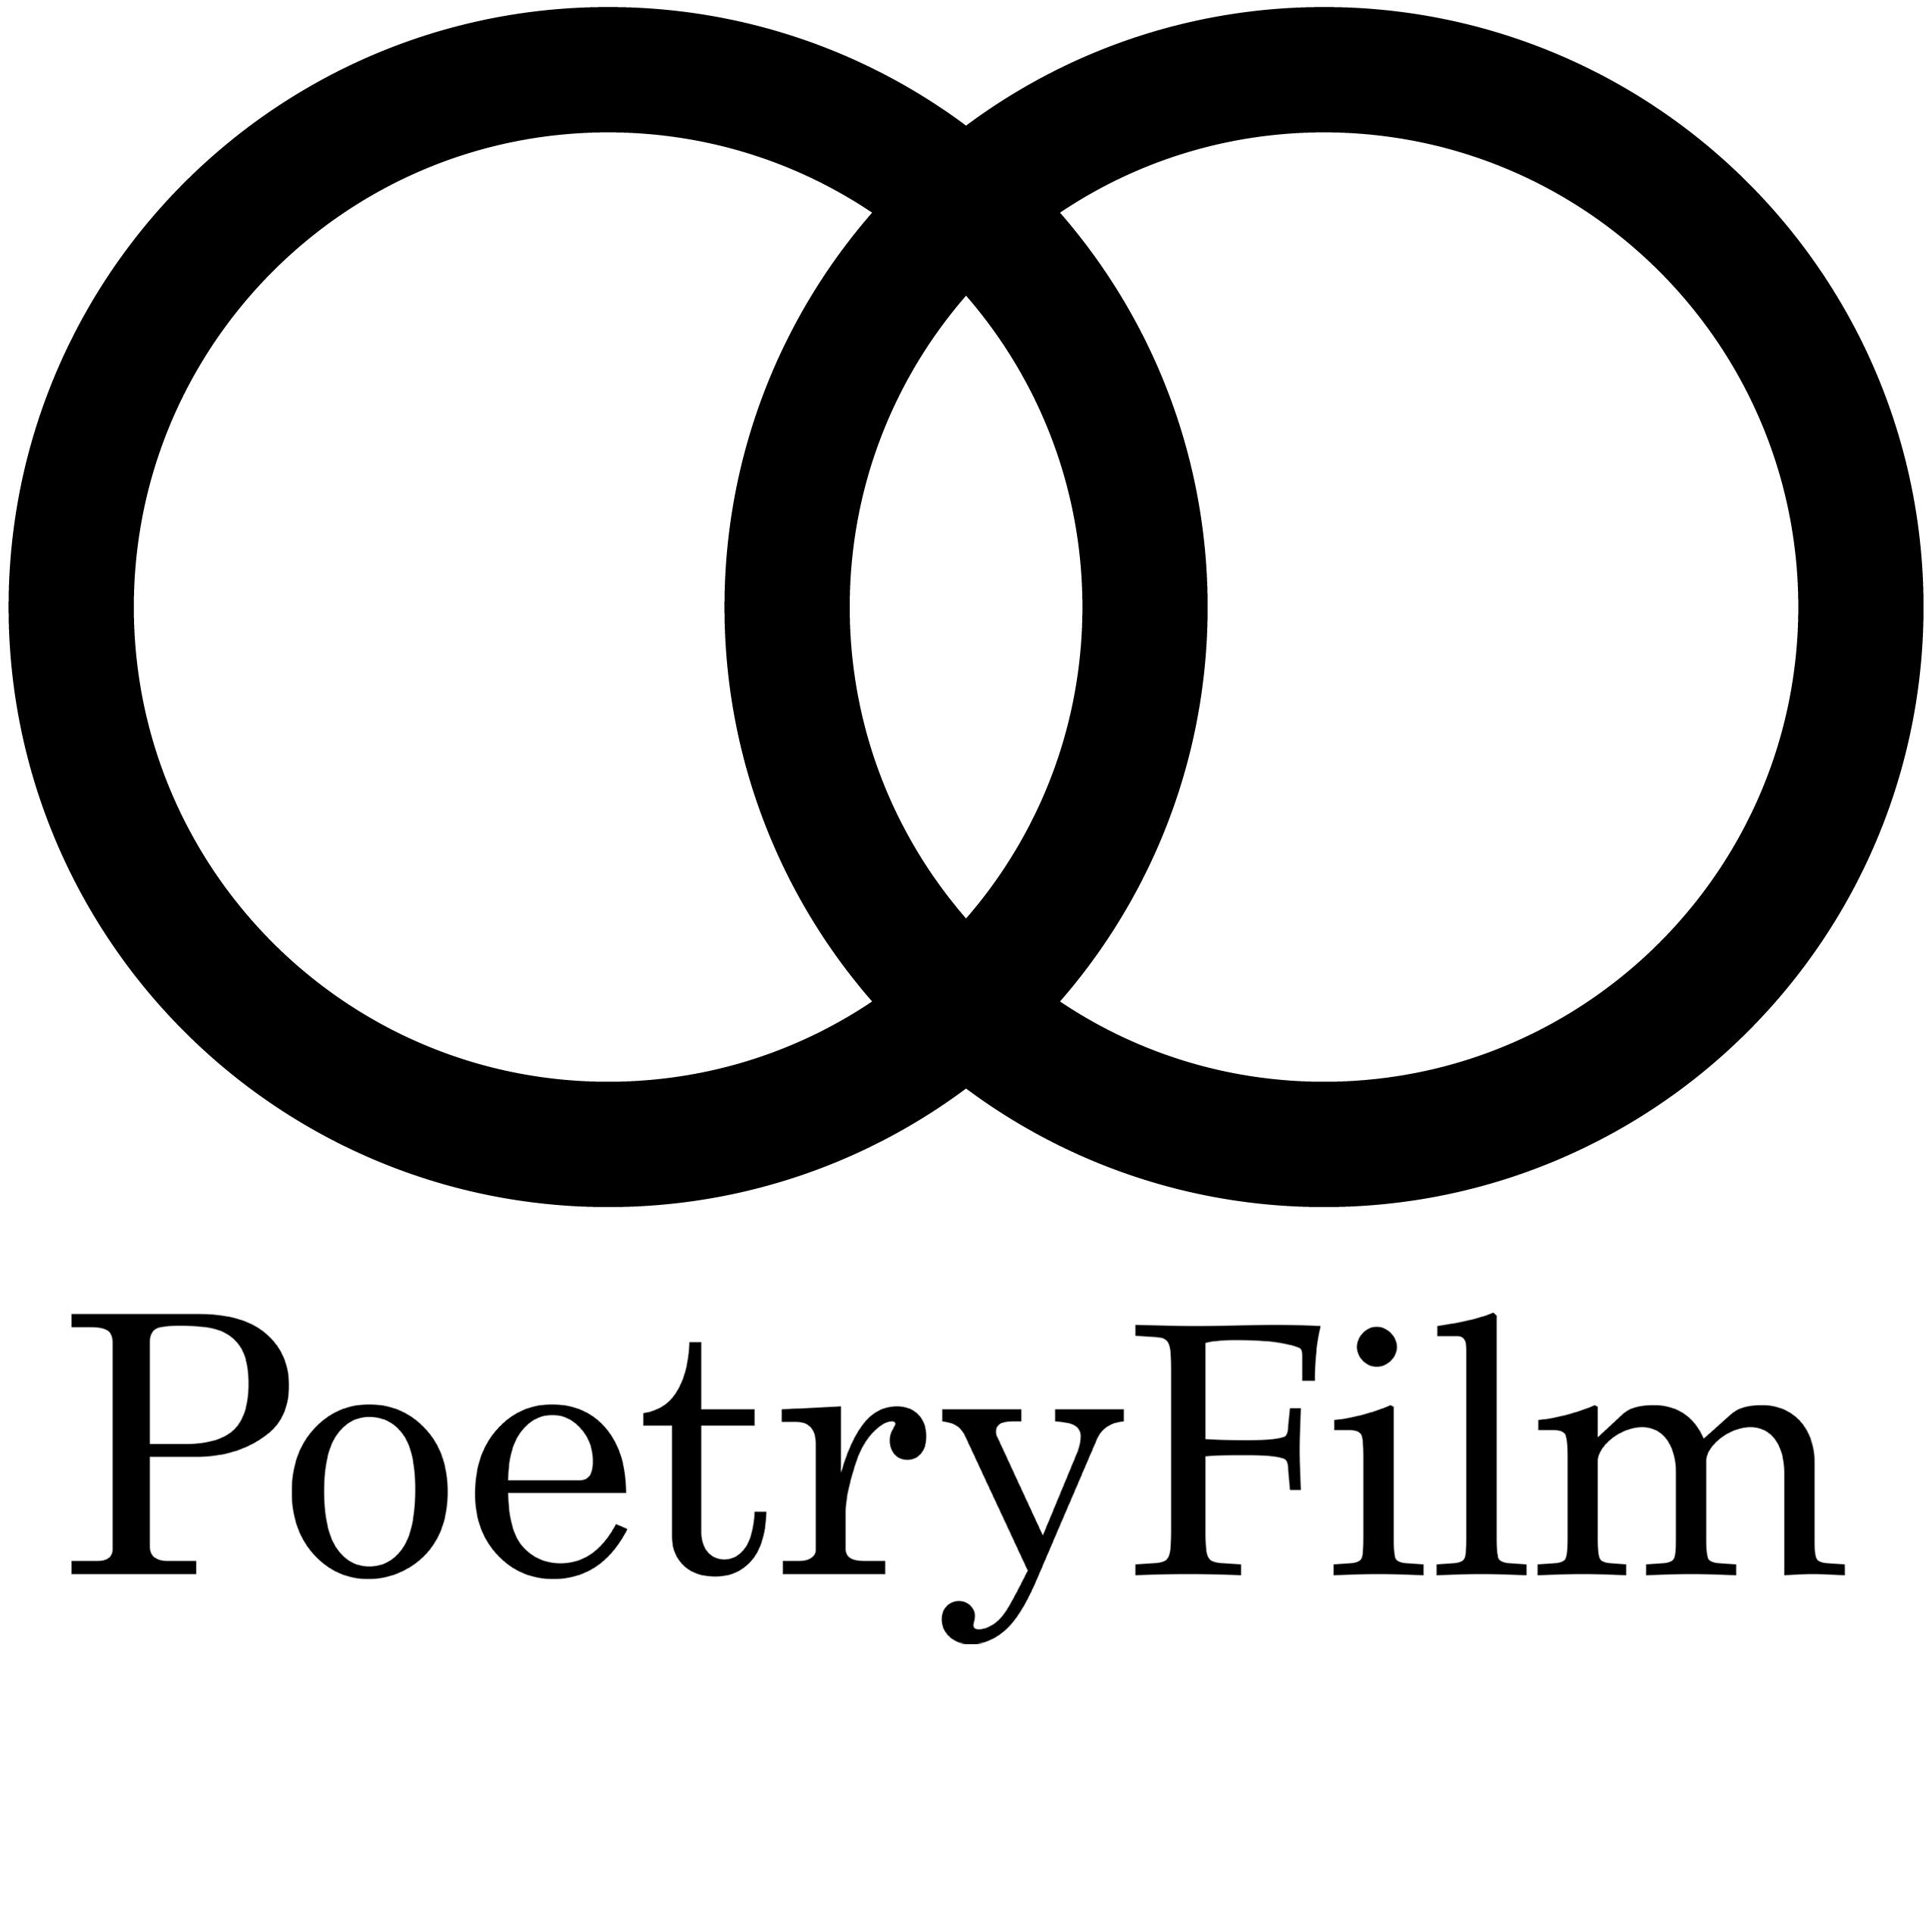 Poetryfilm logo